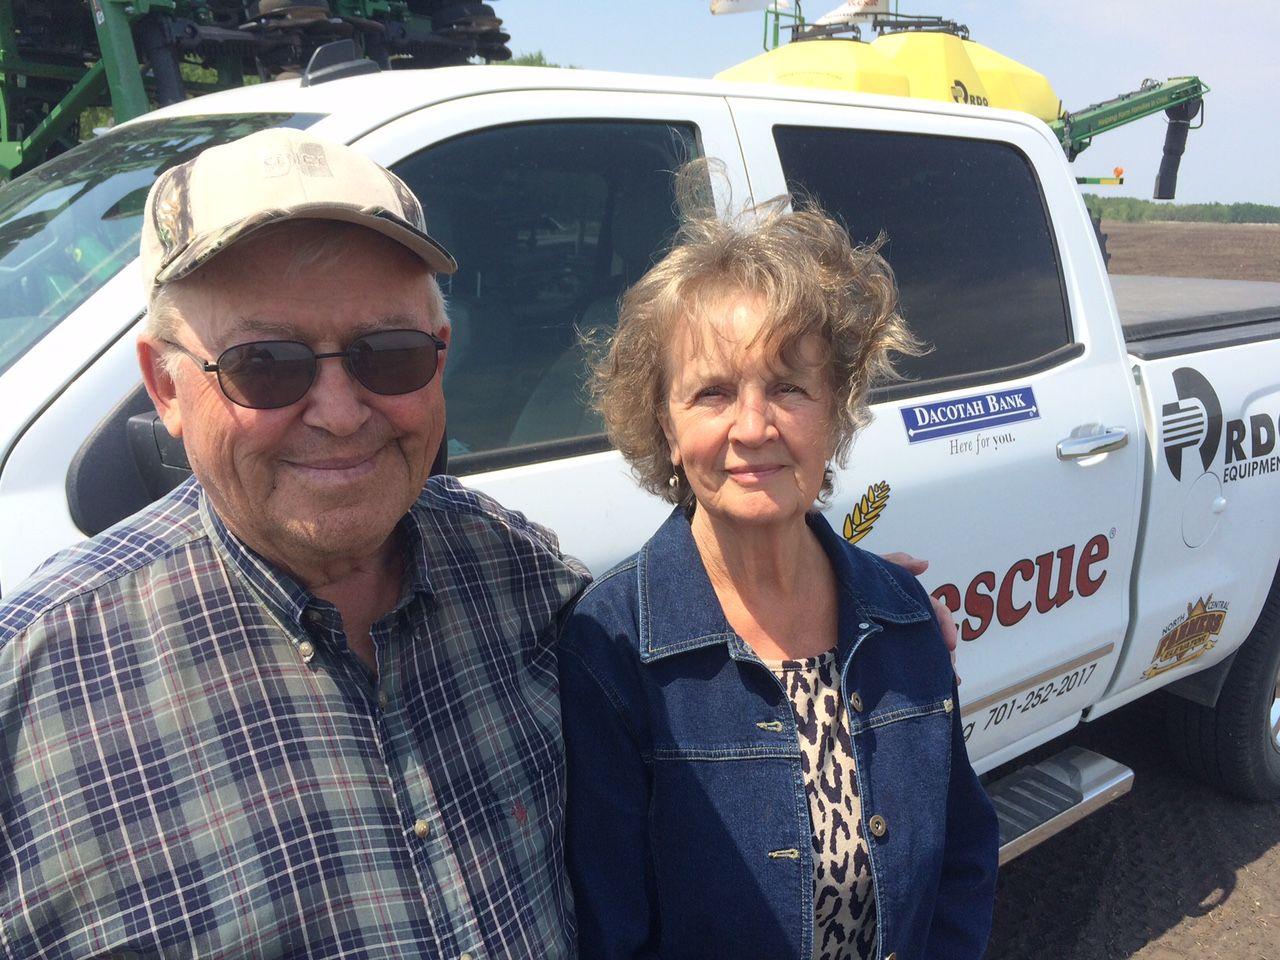 Dennis and Sharon McCullough